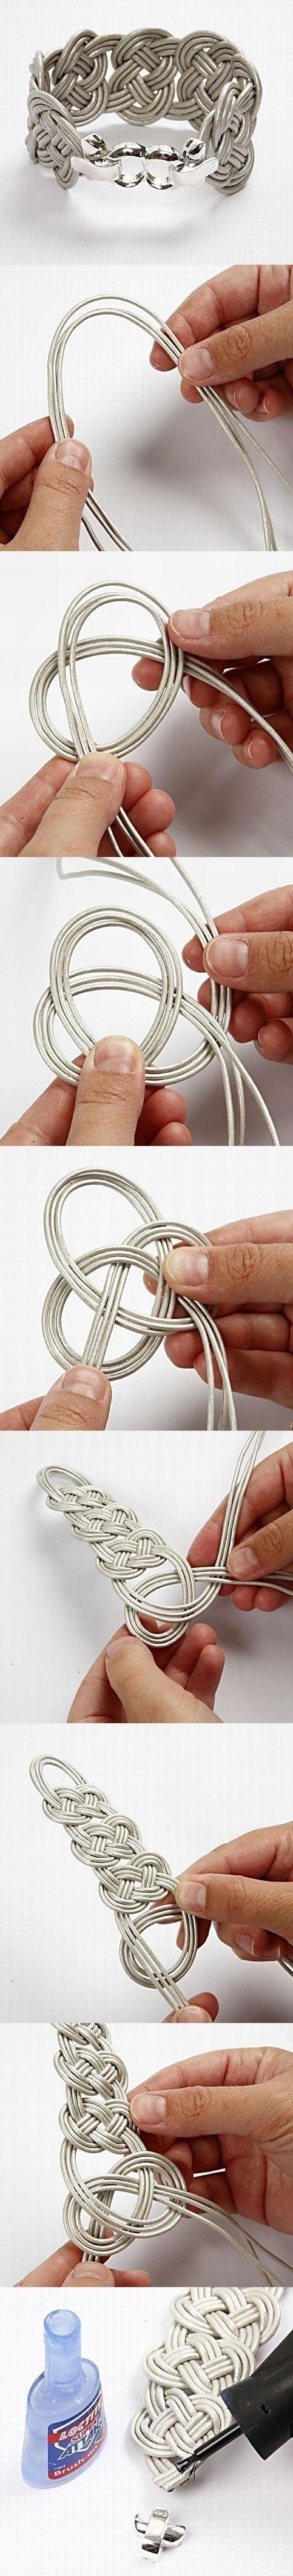 Bracelet stubborn rabbit sewing pinterest rabbit and bracelets